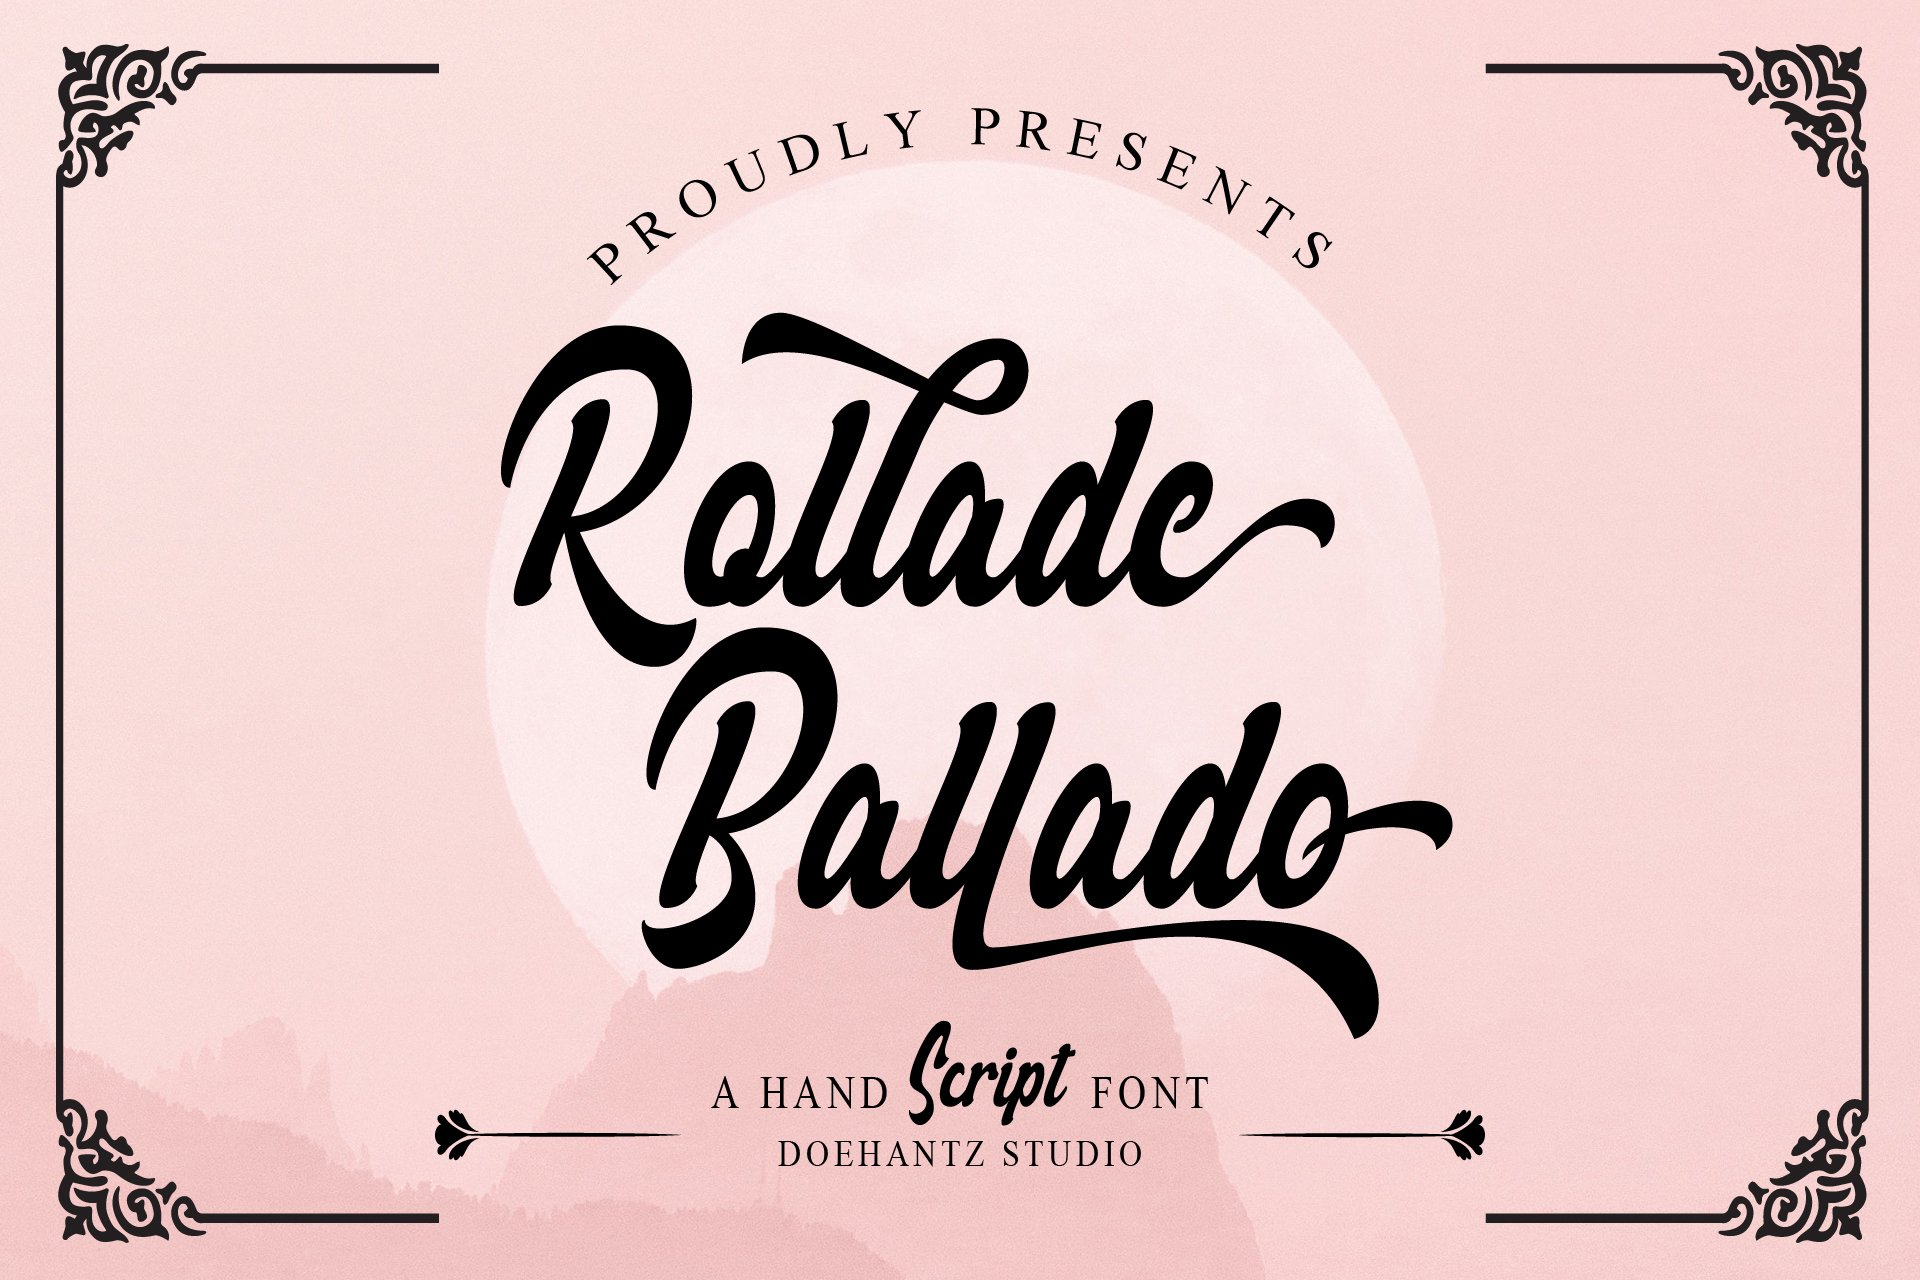 Rollade Ballado Bold Script Font -1